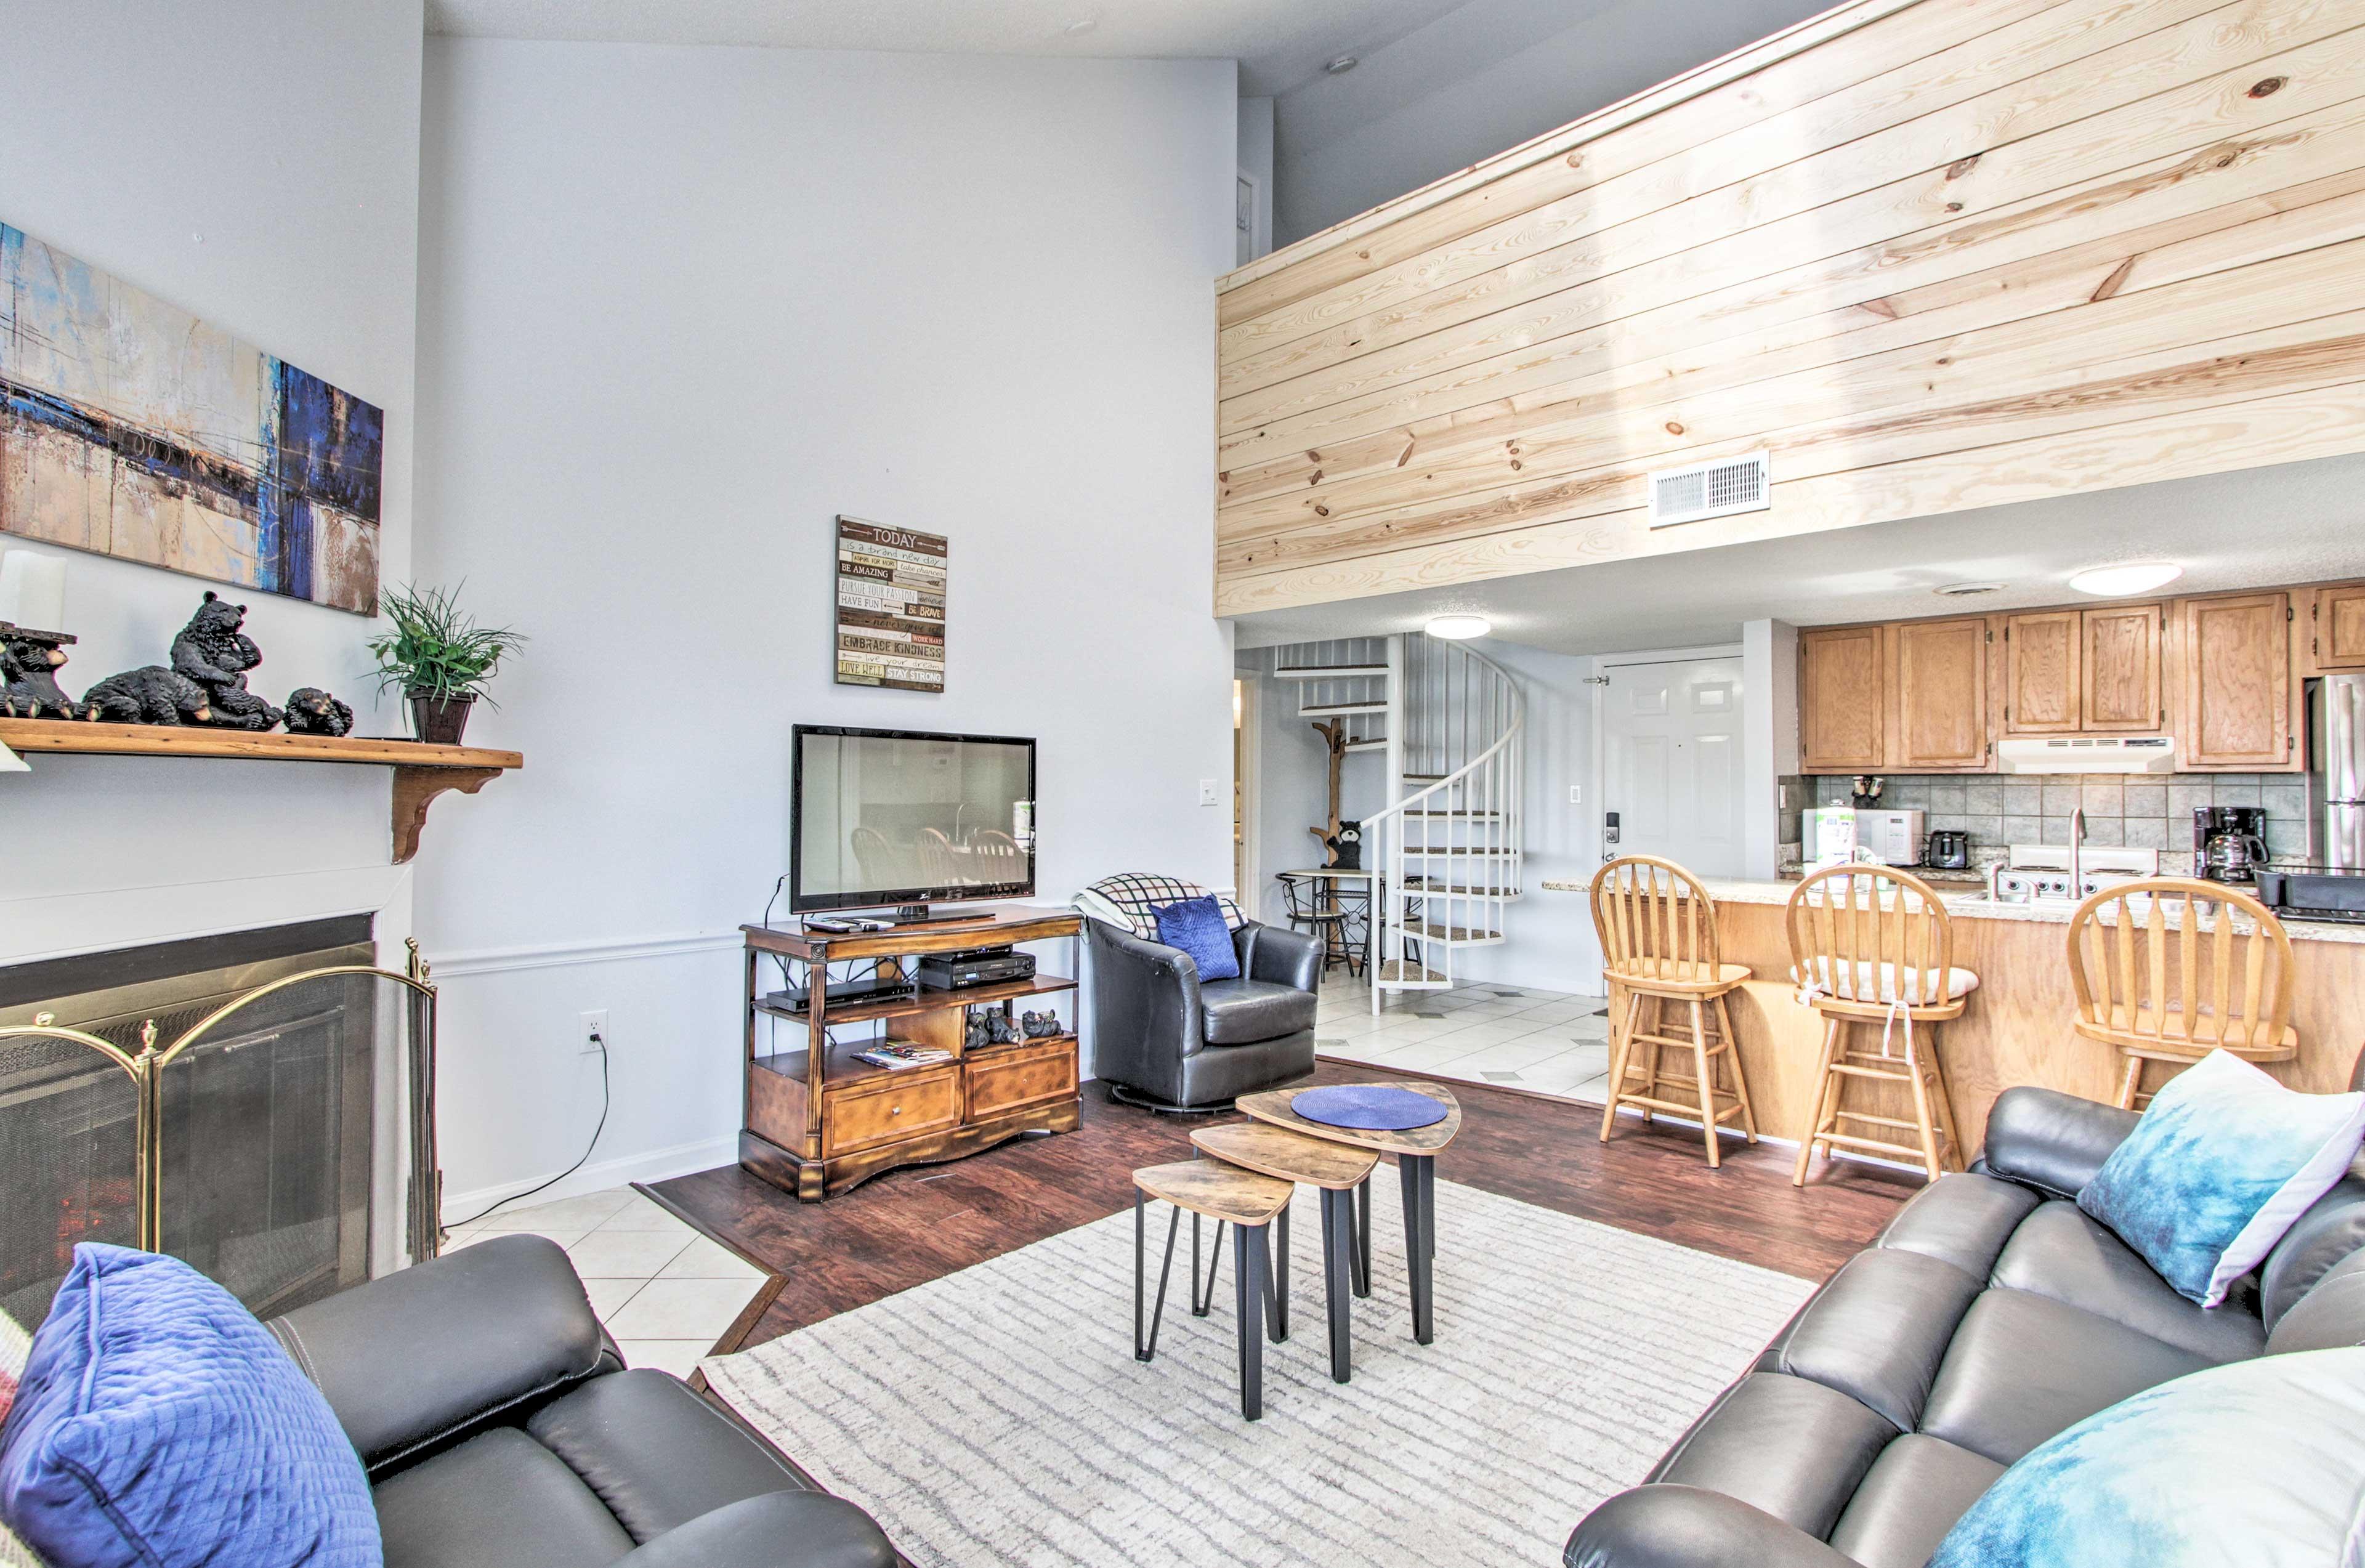 This condo boasts tasteful decor & a spacious open-concept layout.